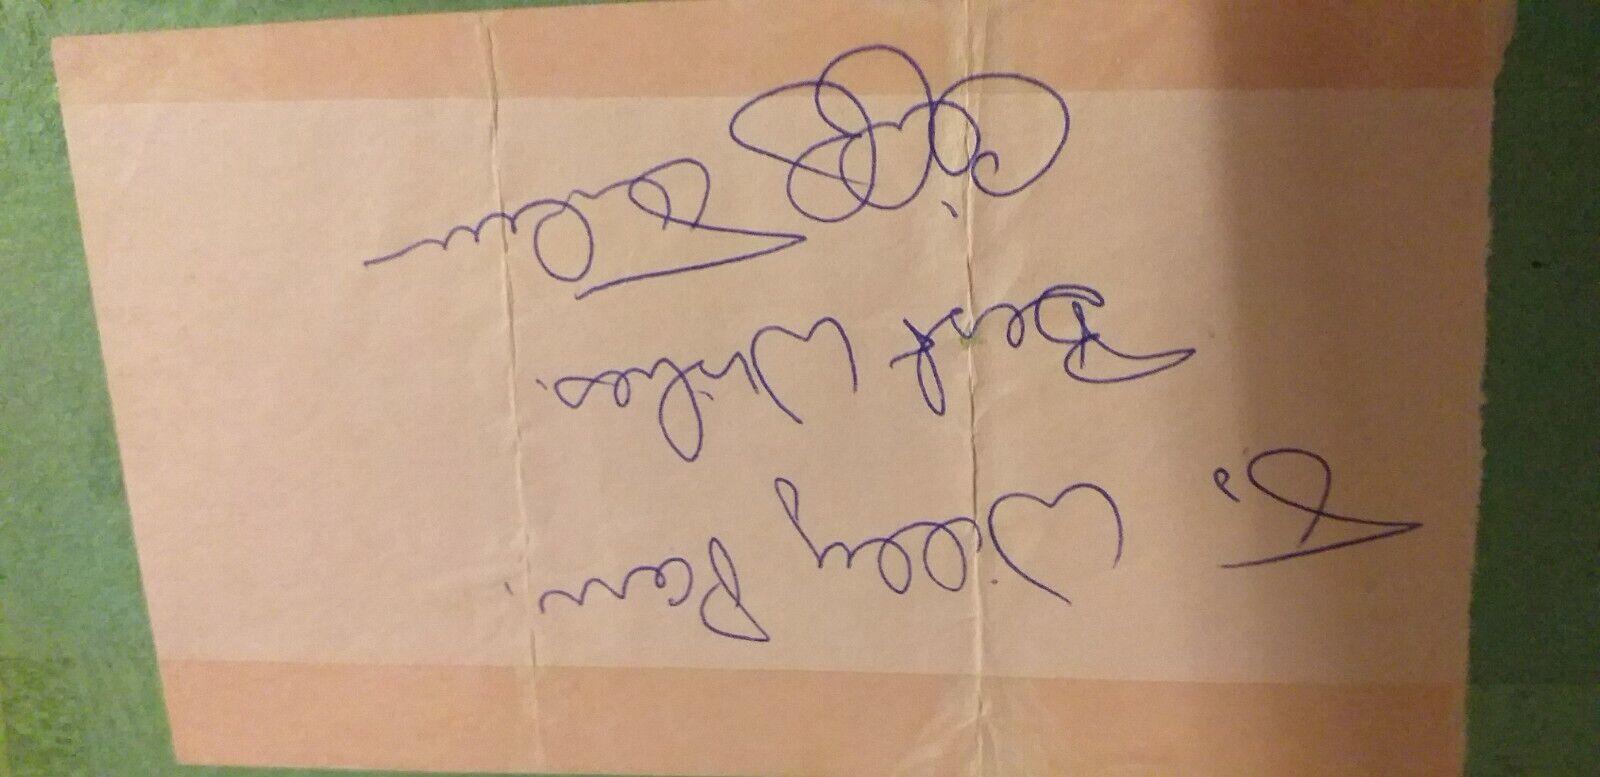 cliff thorburn autograph